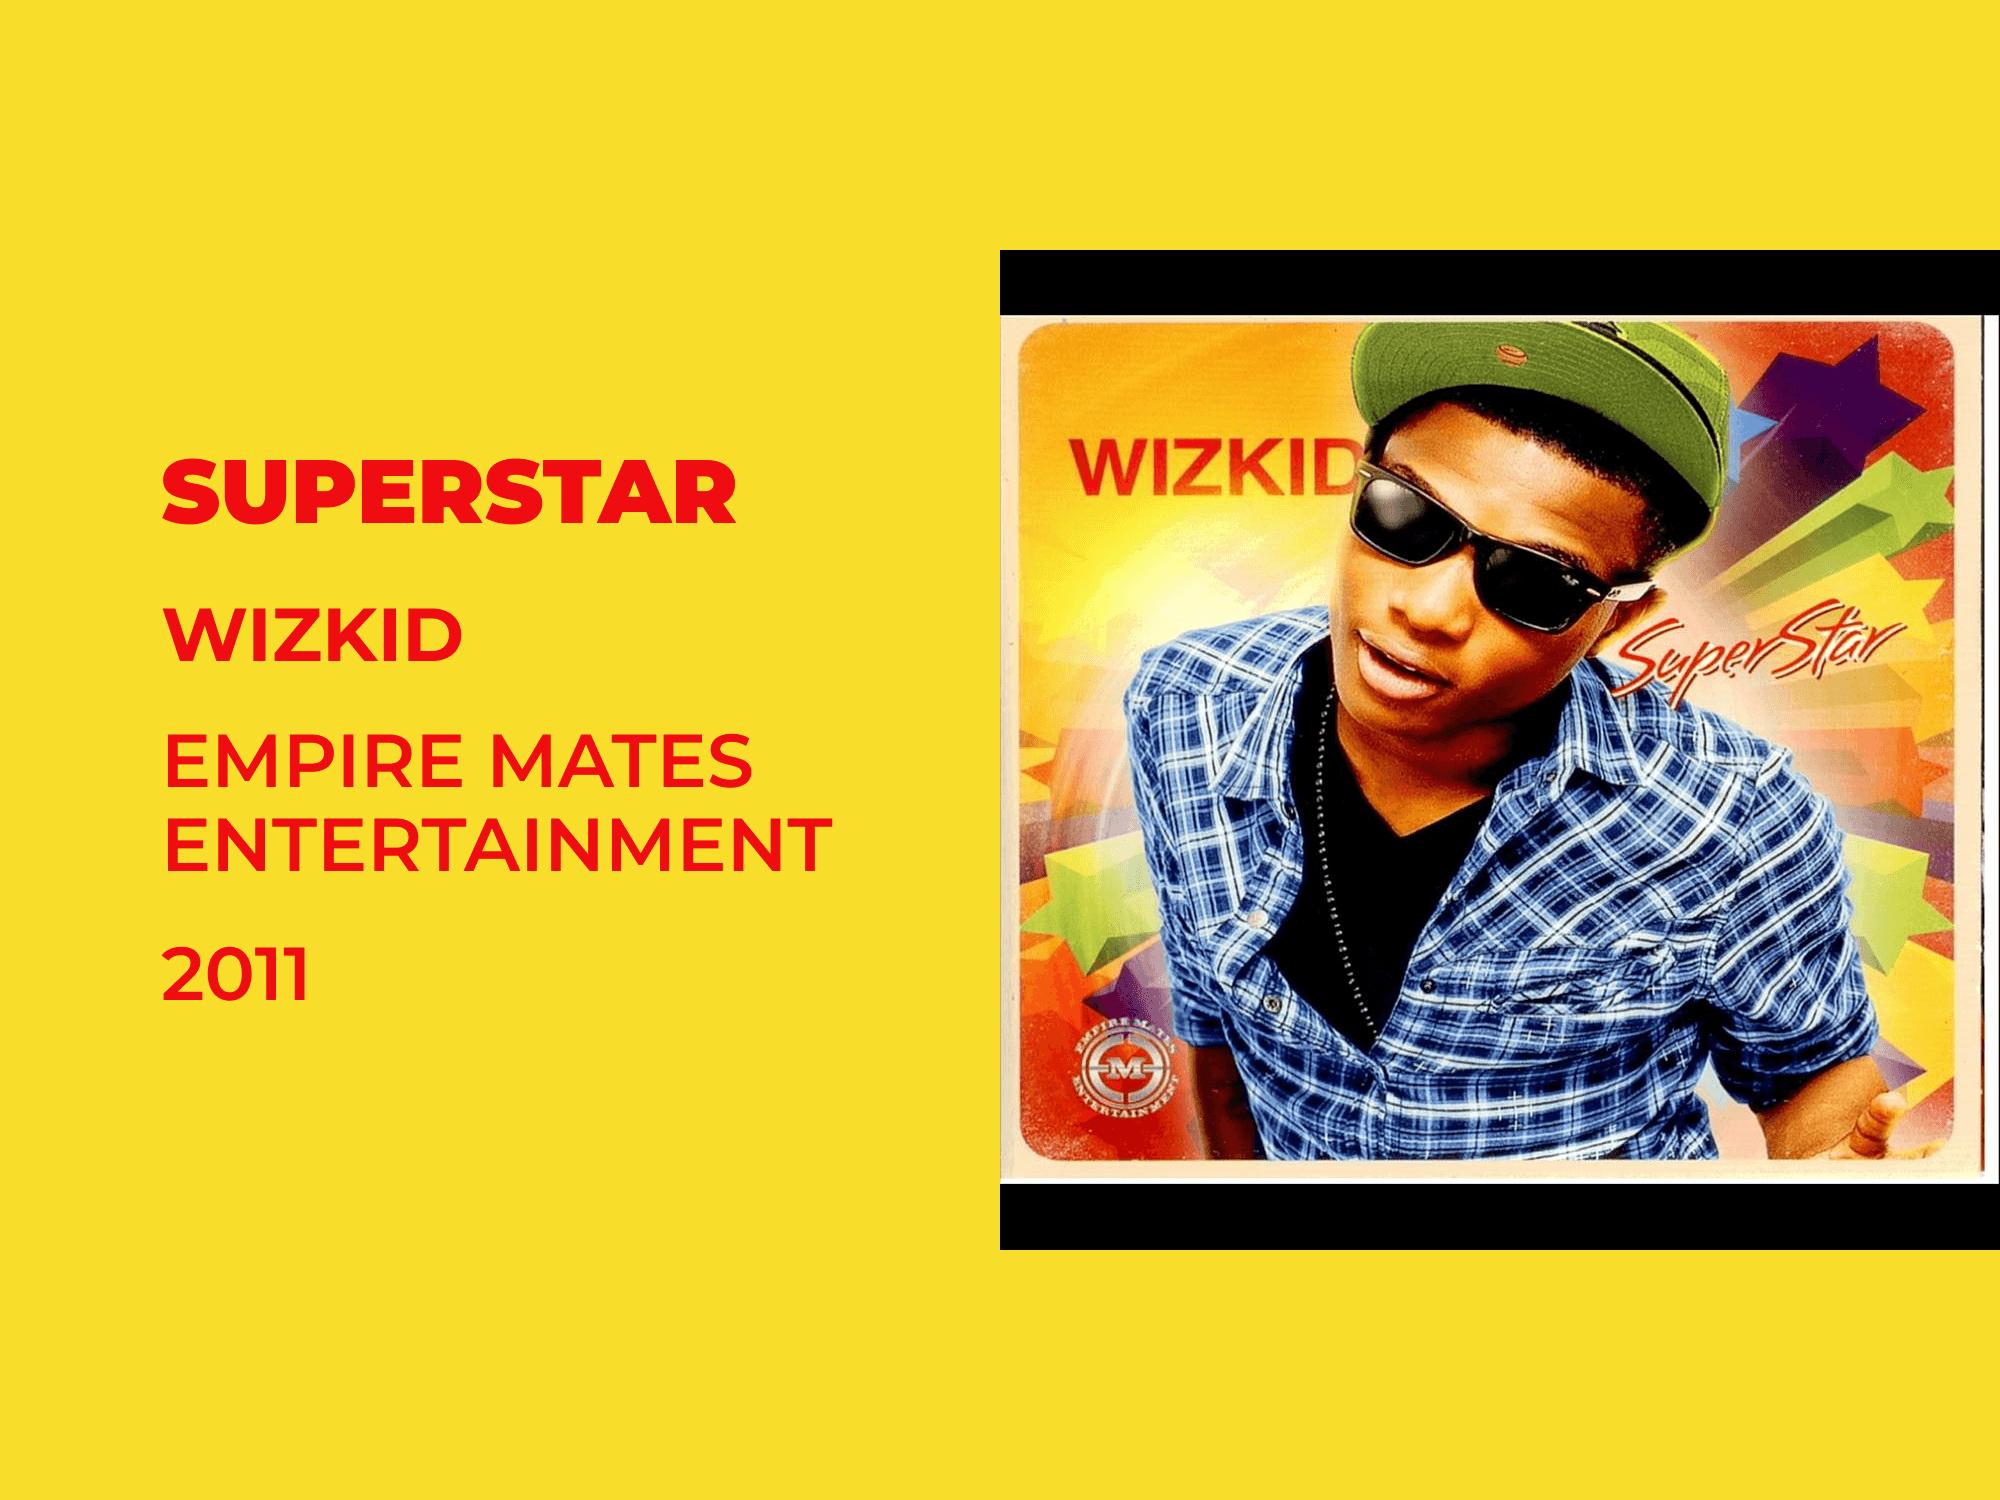 Review: Wizkid's Superstar